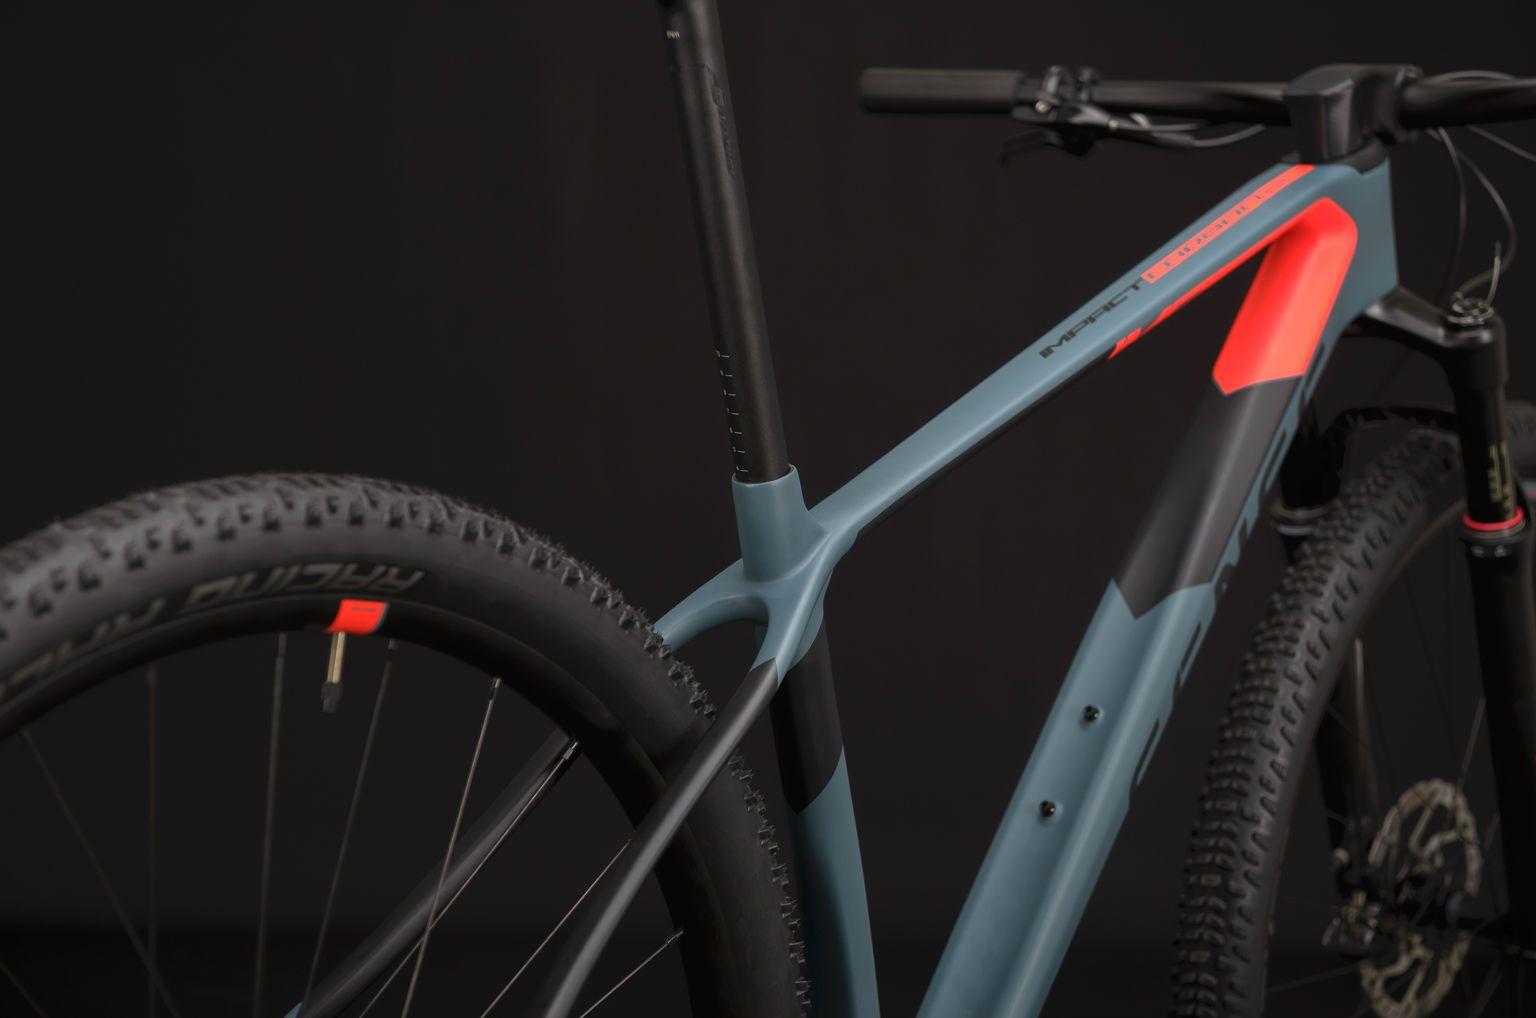 Bicicleta SENSE Impact Carbon Comp 2020 - Vermelho Neon/Chumbo